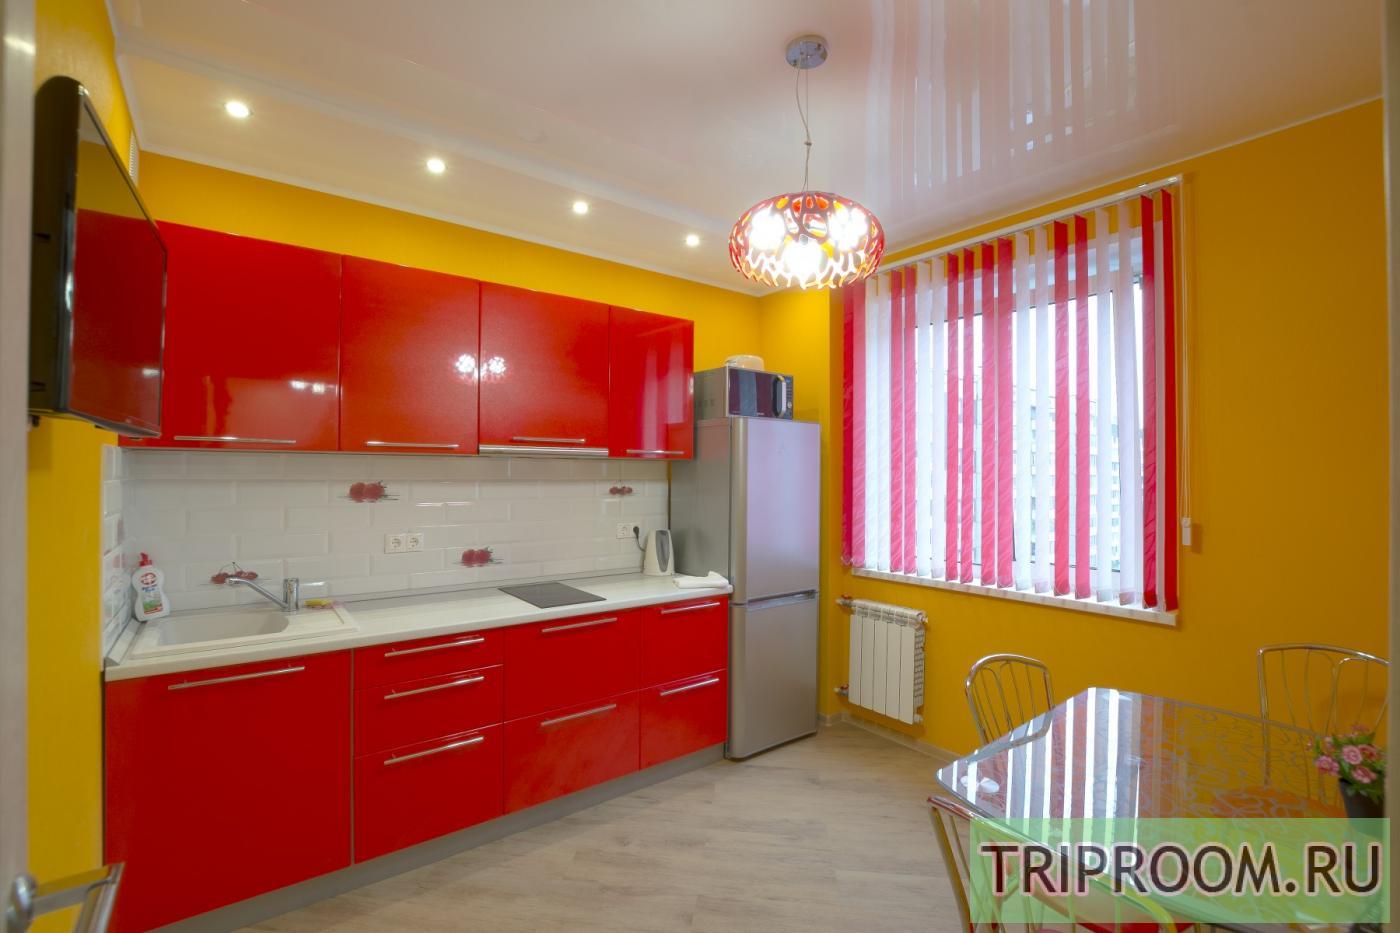 1-комнатная квартира посуточно (вариант № 20514), ул. Водопьянова улица, фото № 5